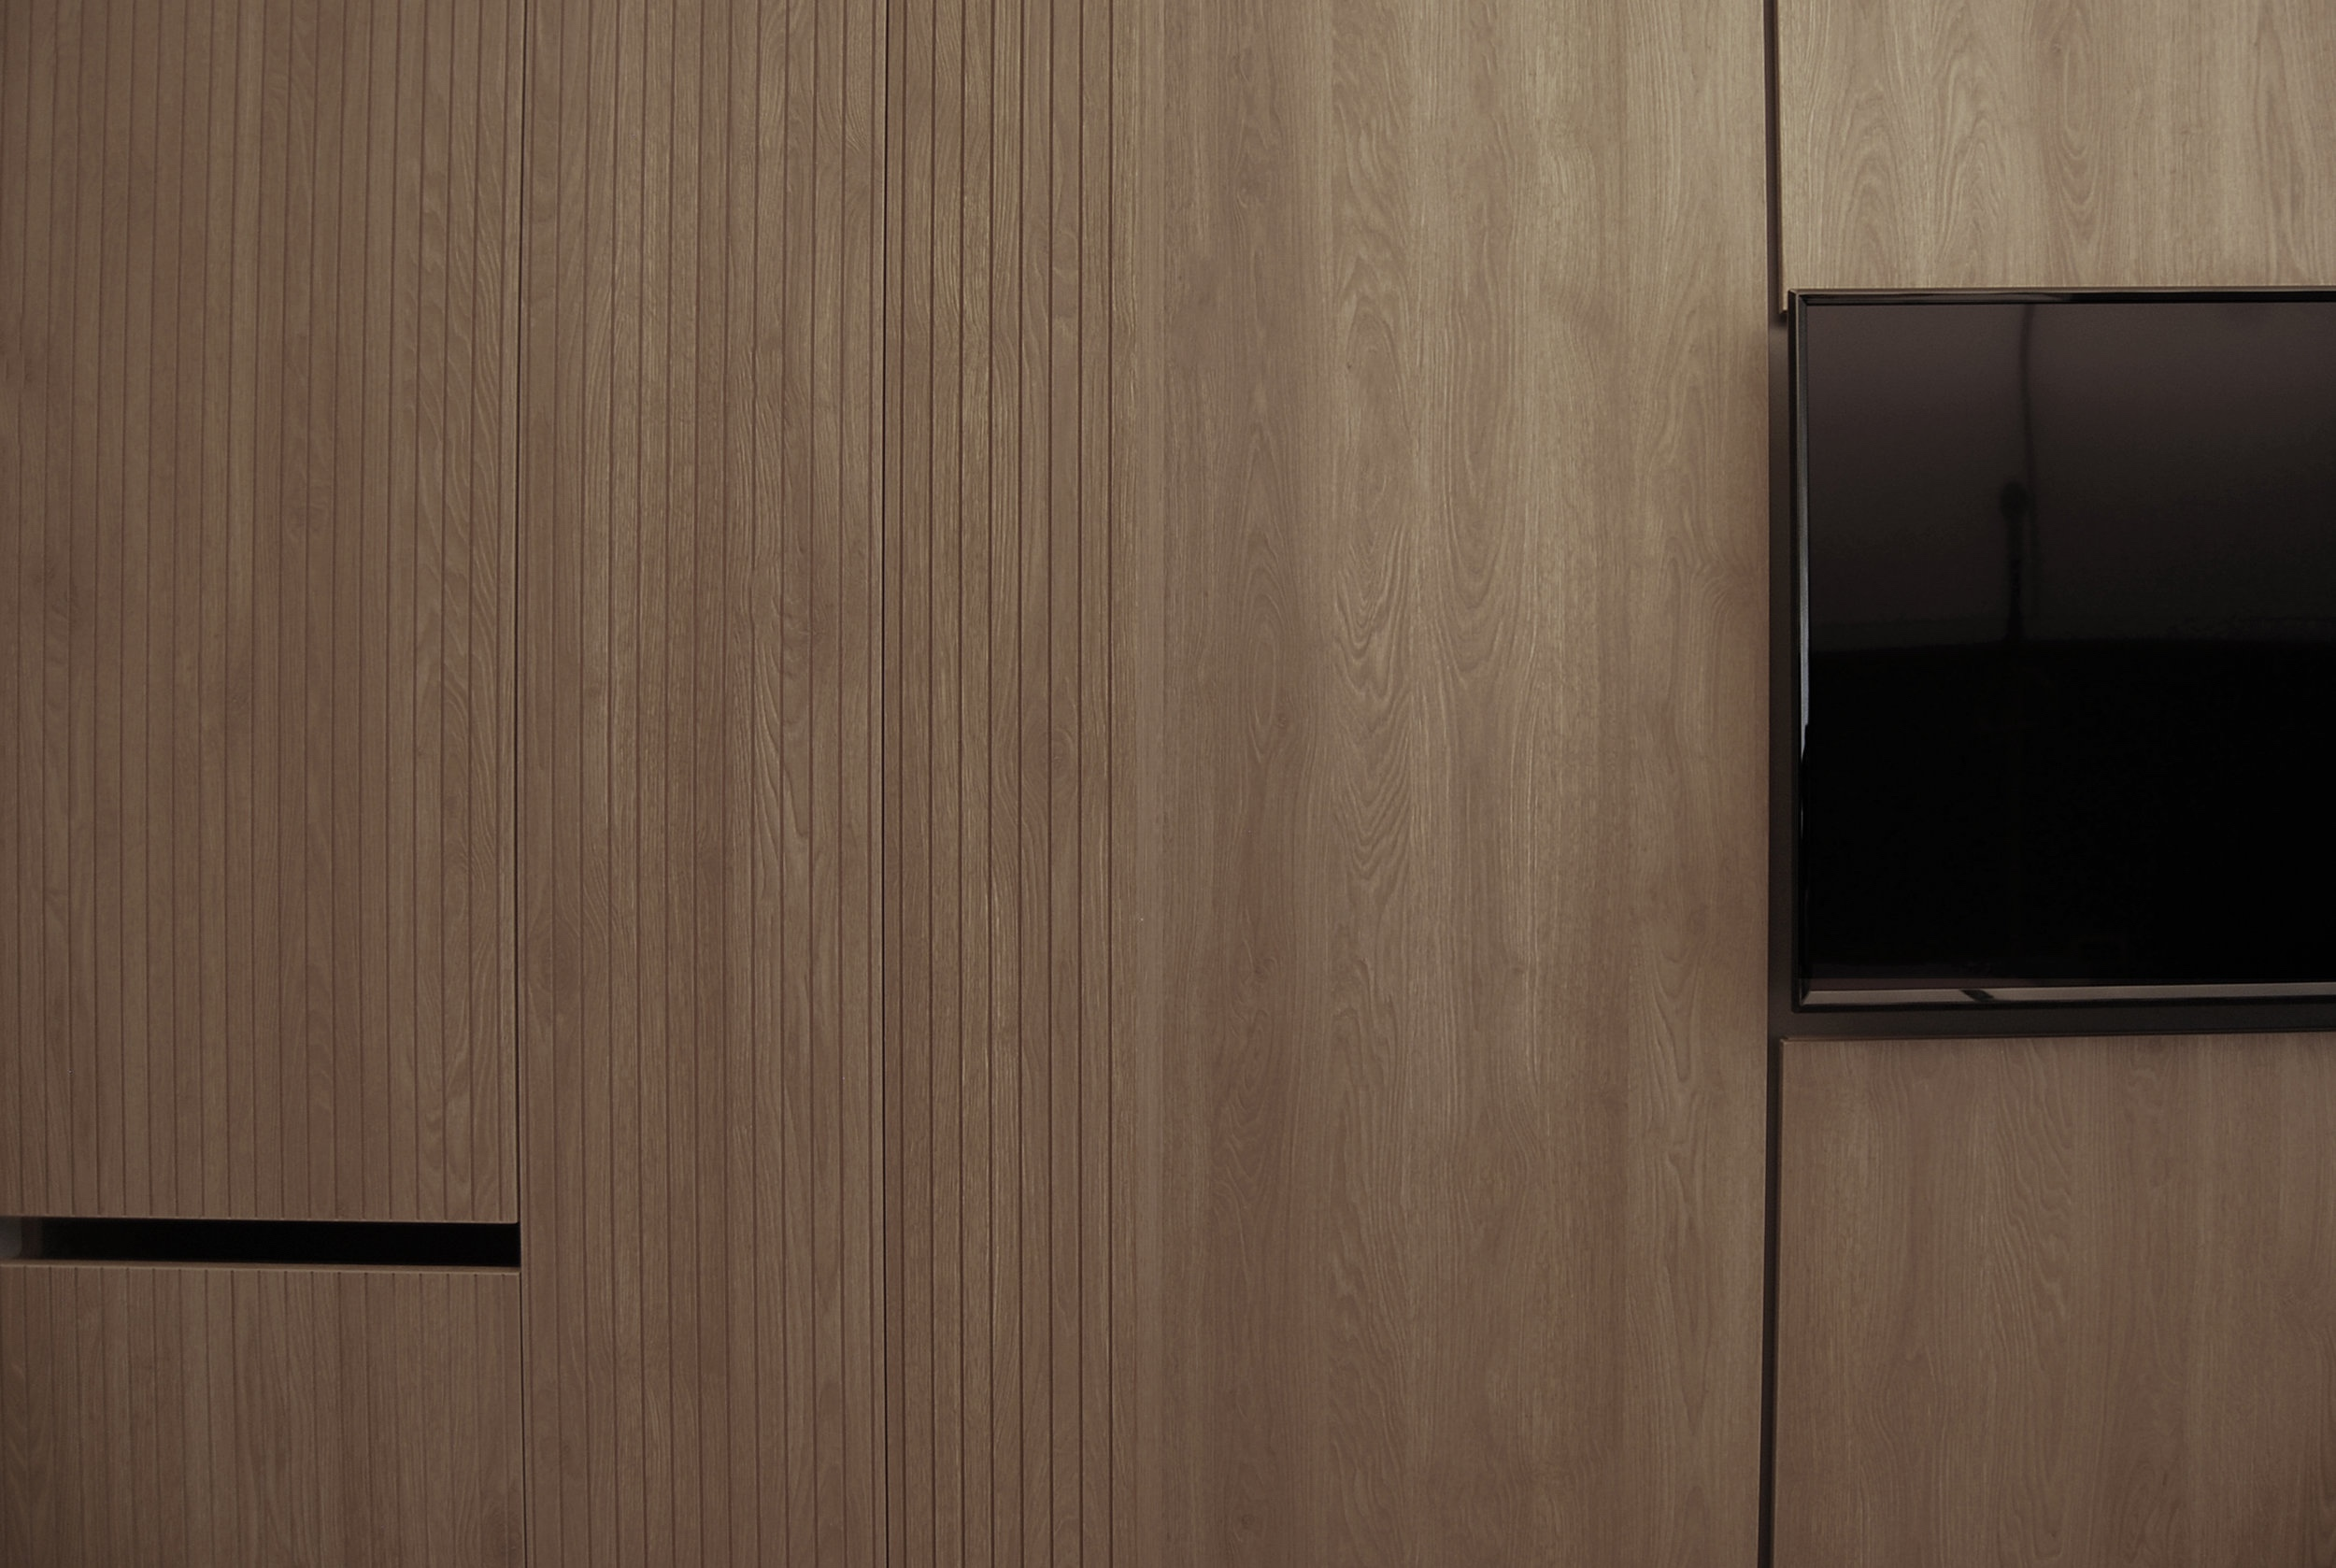 Salvator Mundi International Hospital Ensuite Room - wall detail -